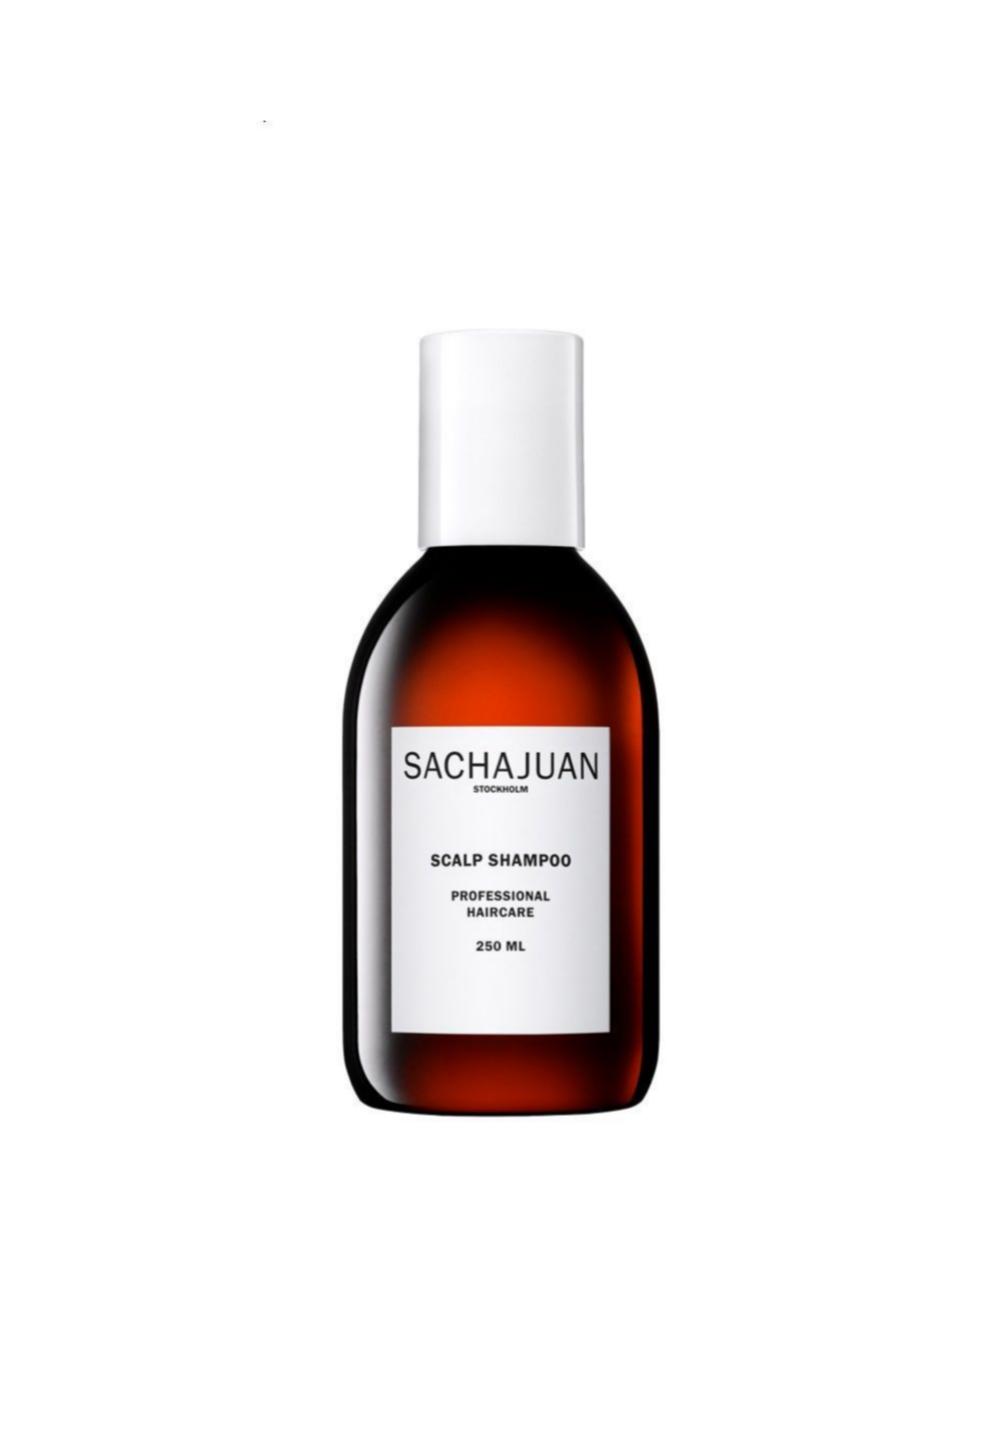 Scalp Shampoo de Sachajuan, 22 .